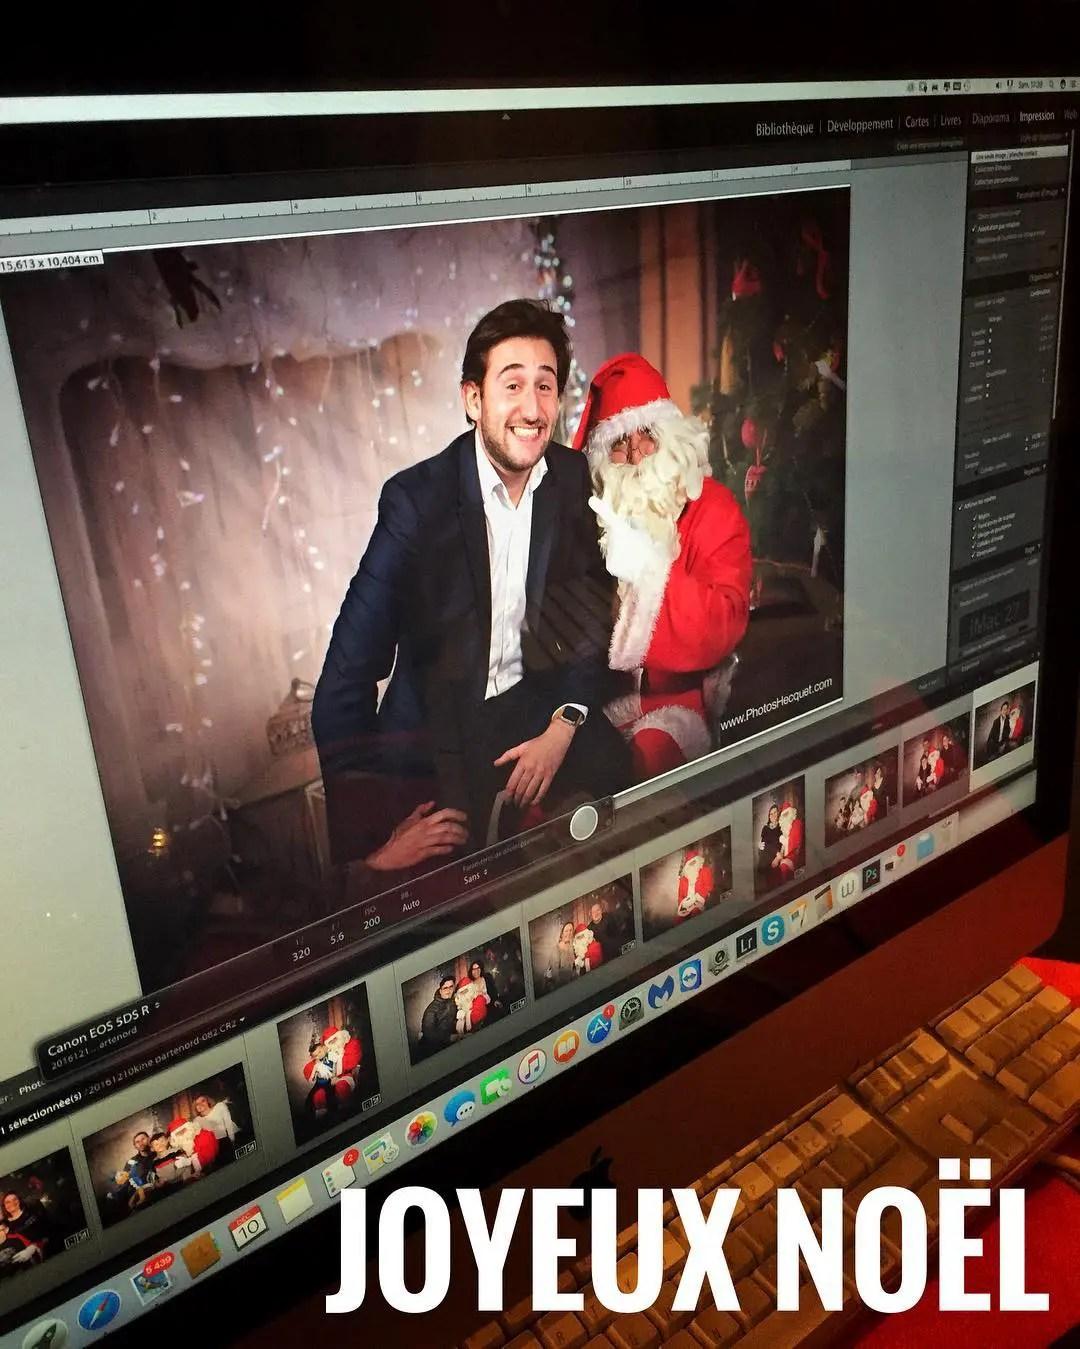 Tom Le Magicien - Joyeux Noel